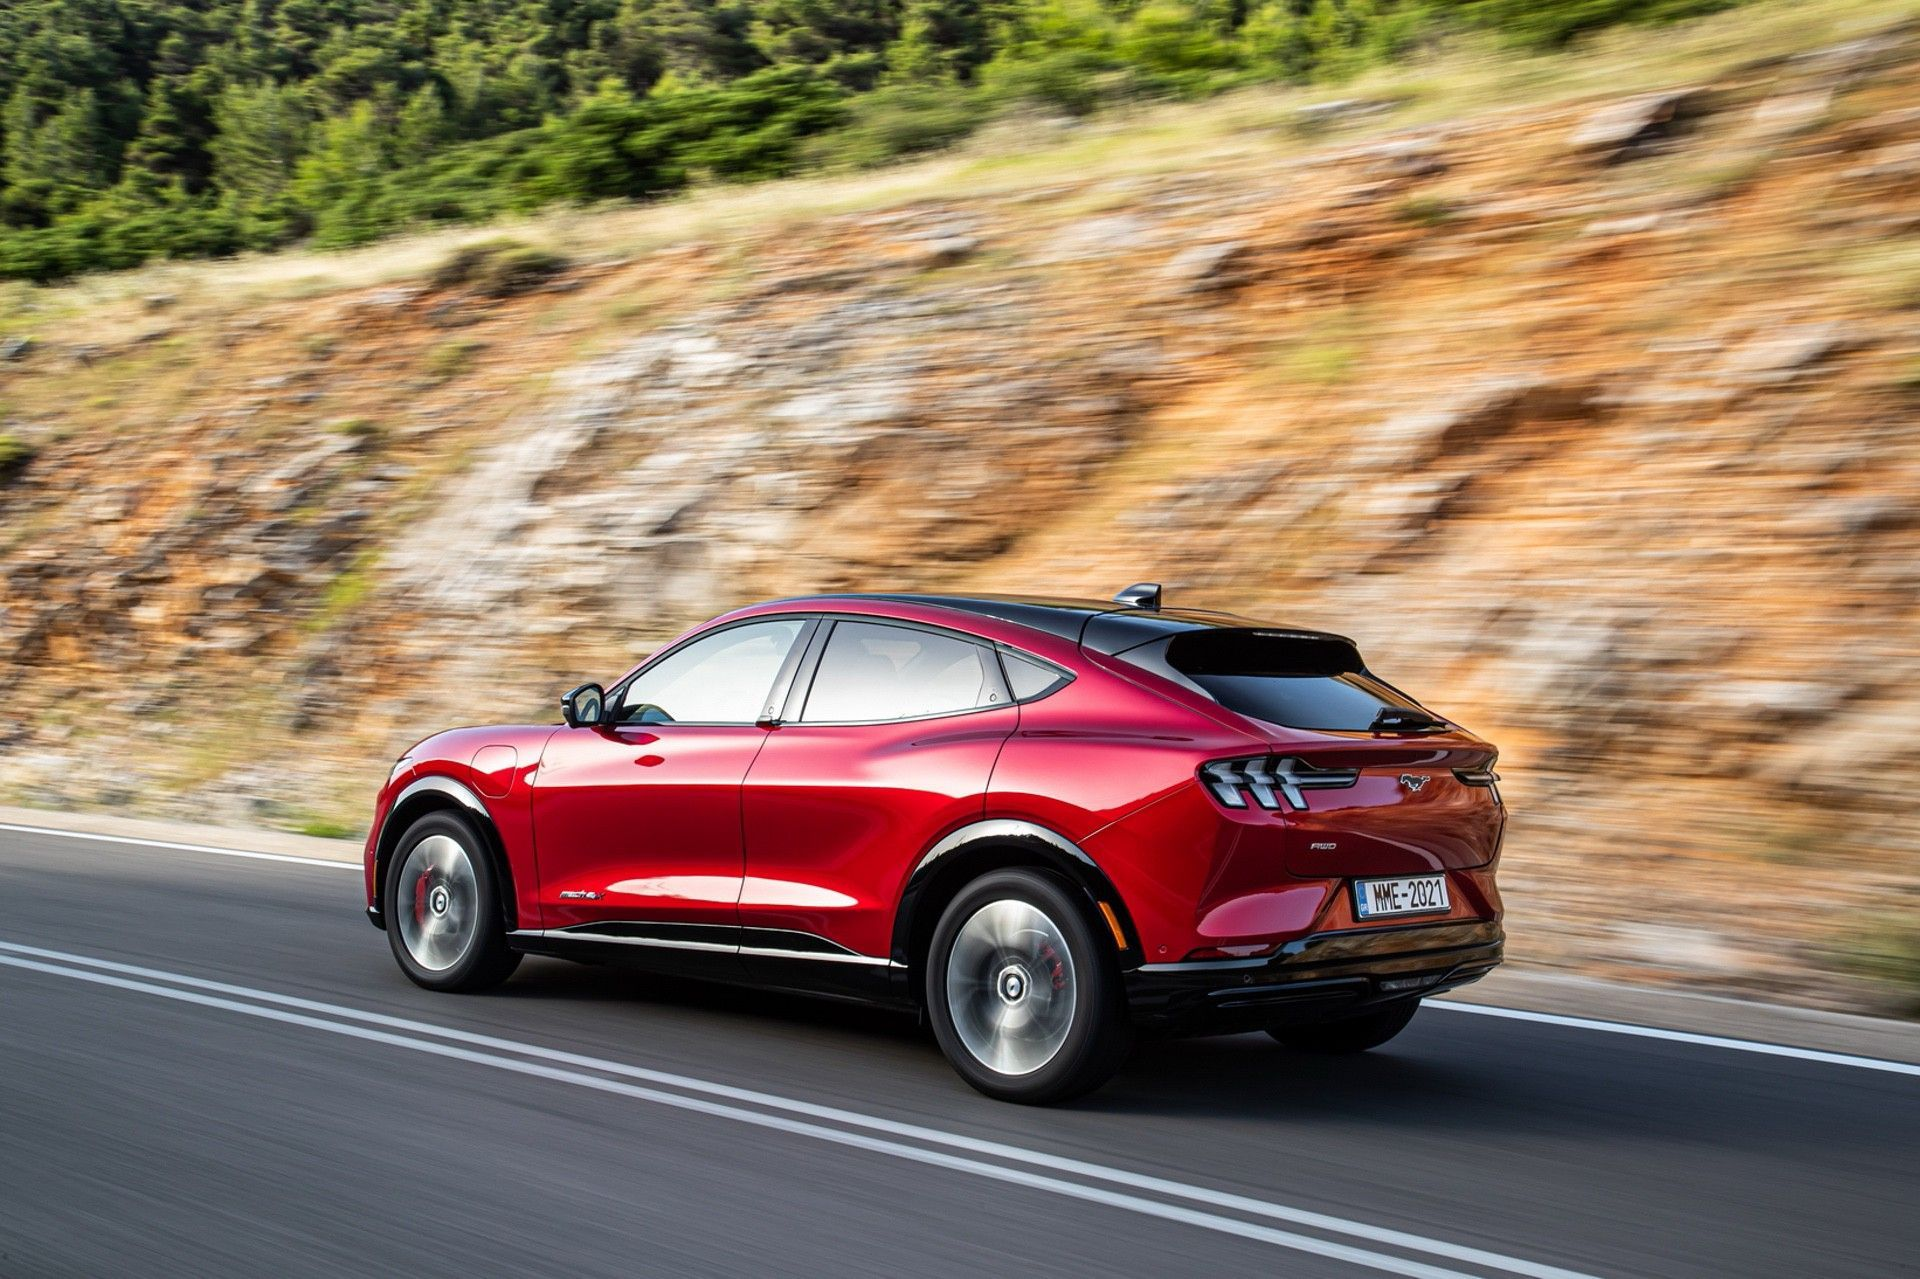 Ford_Mustang_Mach-E_greek_presskit-0128